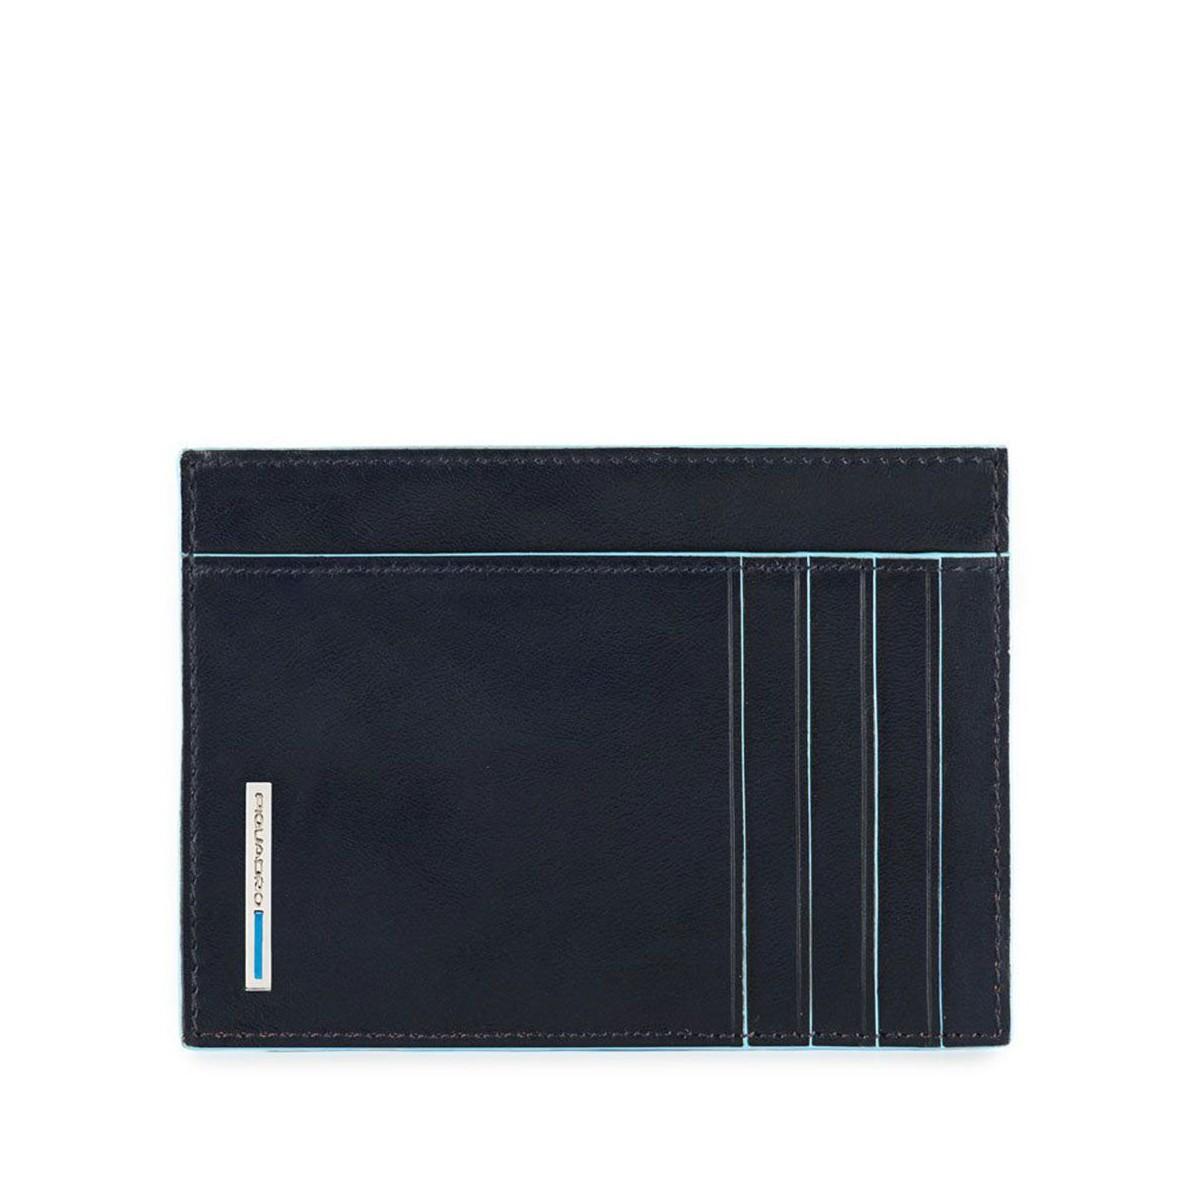 PIQUADRO Blue Square bustina grande porta documenti, pelle blu